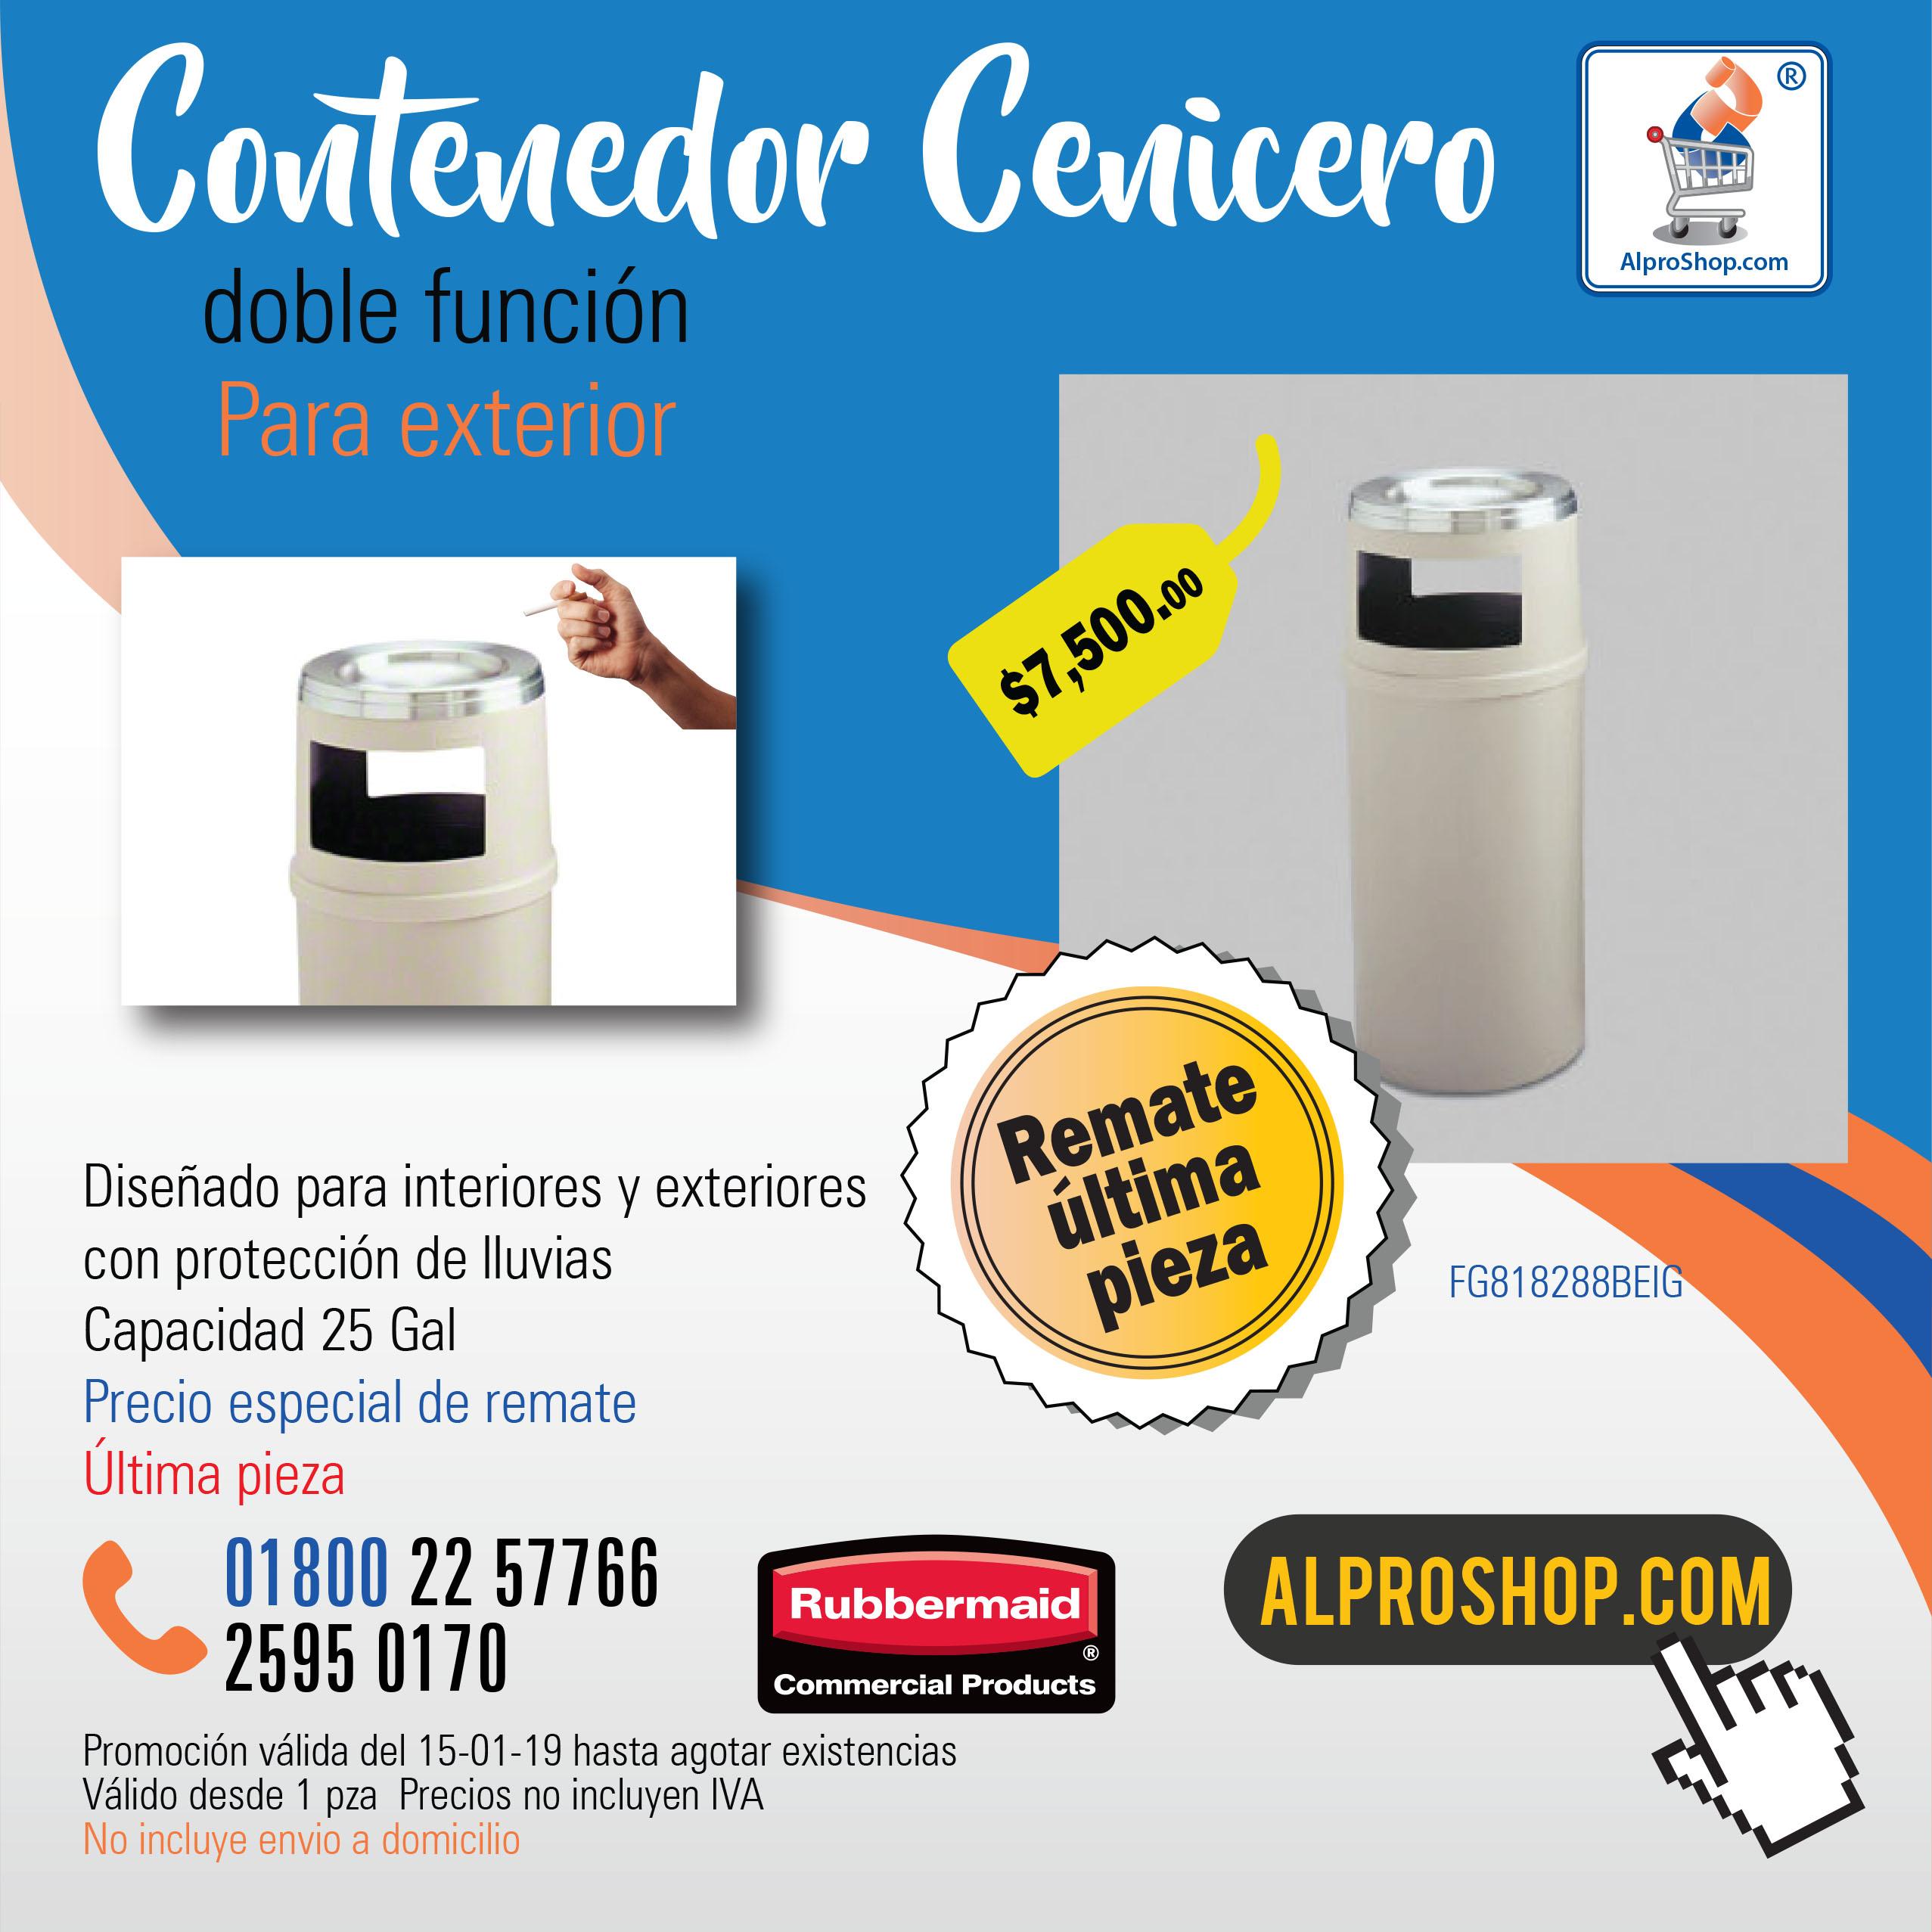 contenedor-cenicero-8182-88.jpg